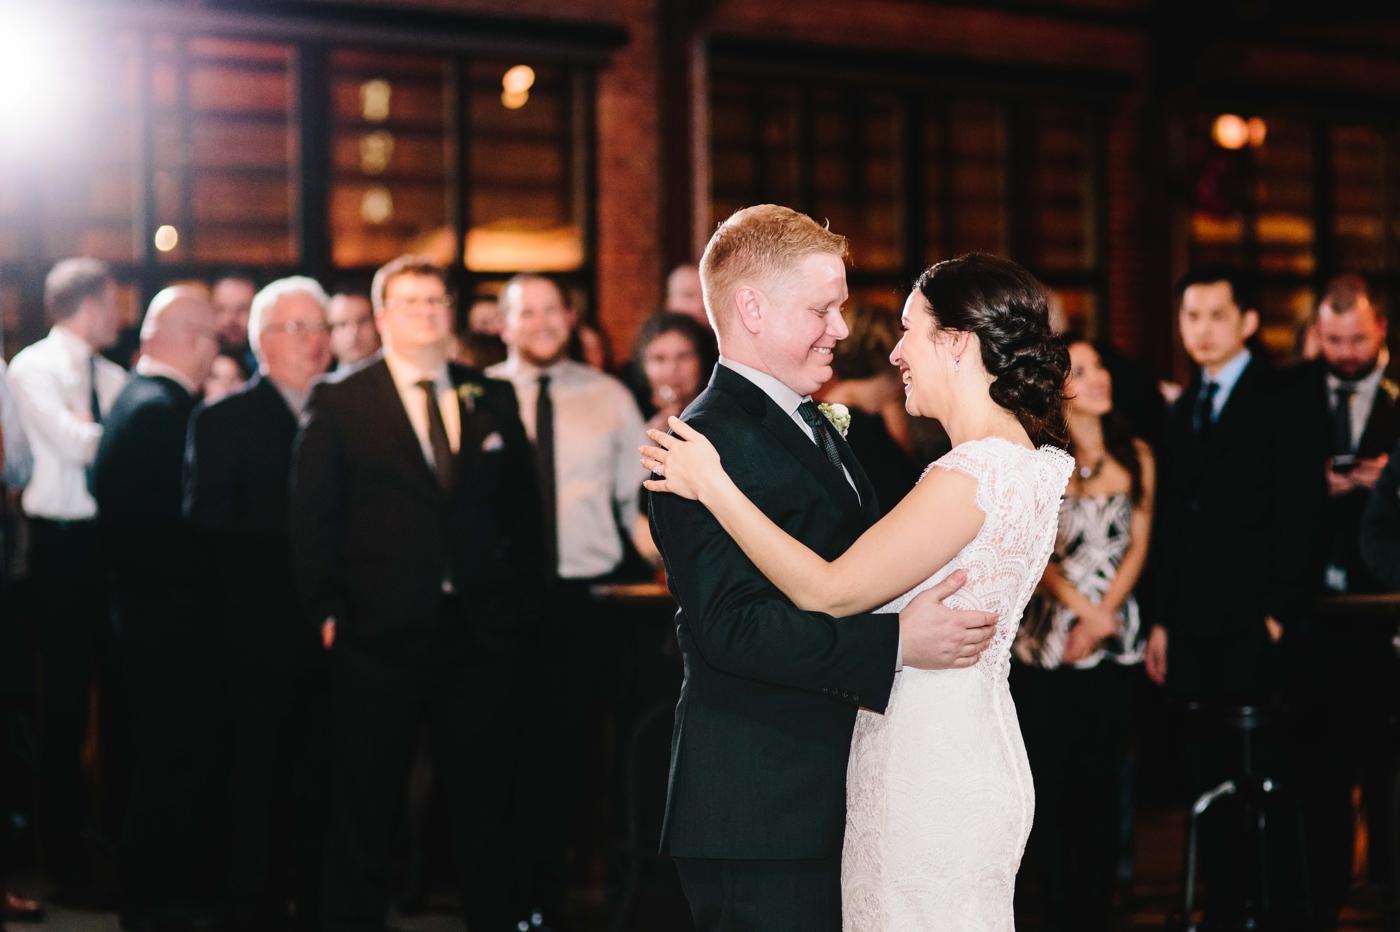 chicago-fine-art-wedding-photography-lintelman48